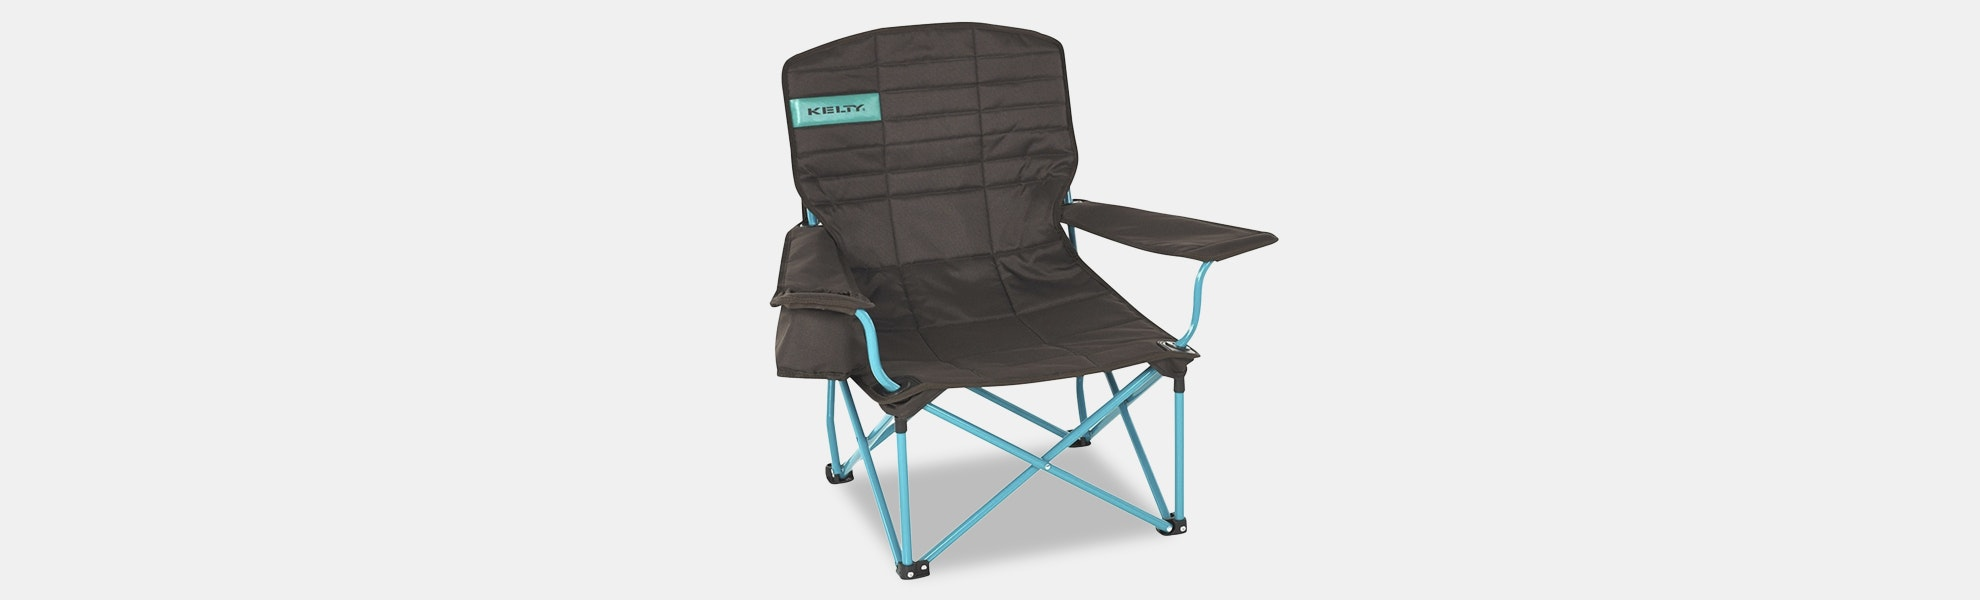 Kelty Lowdown Chairs